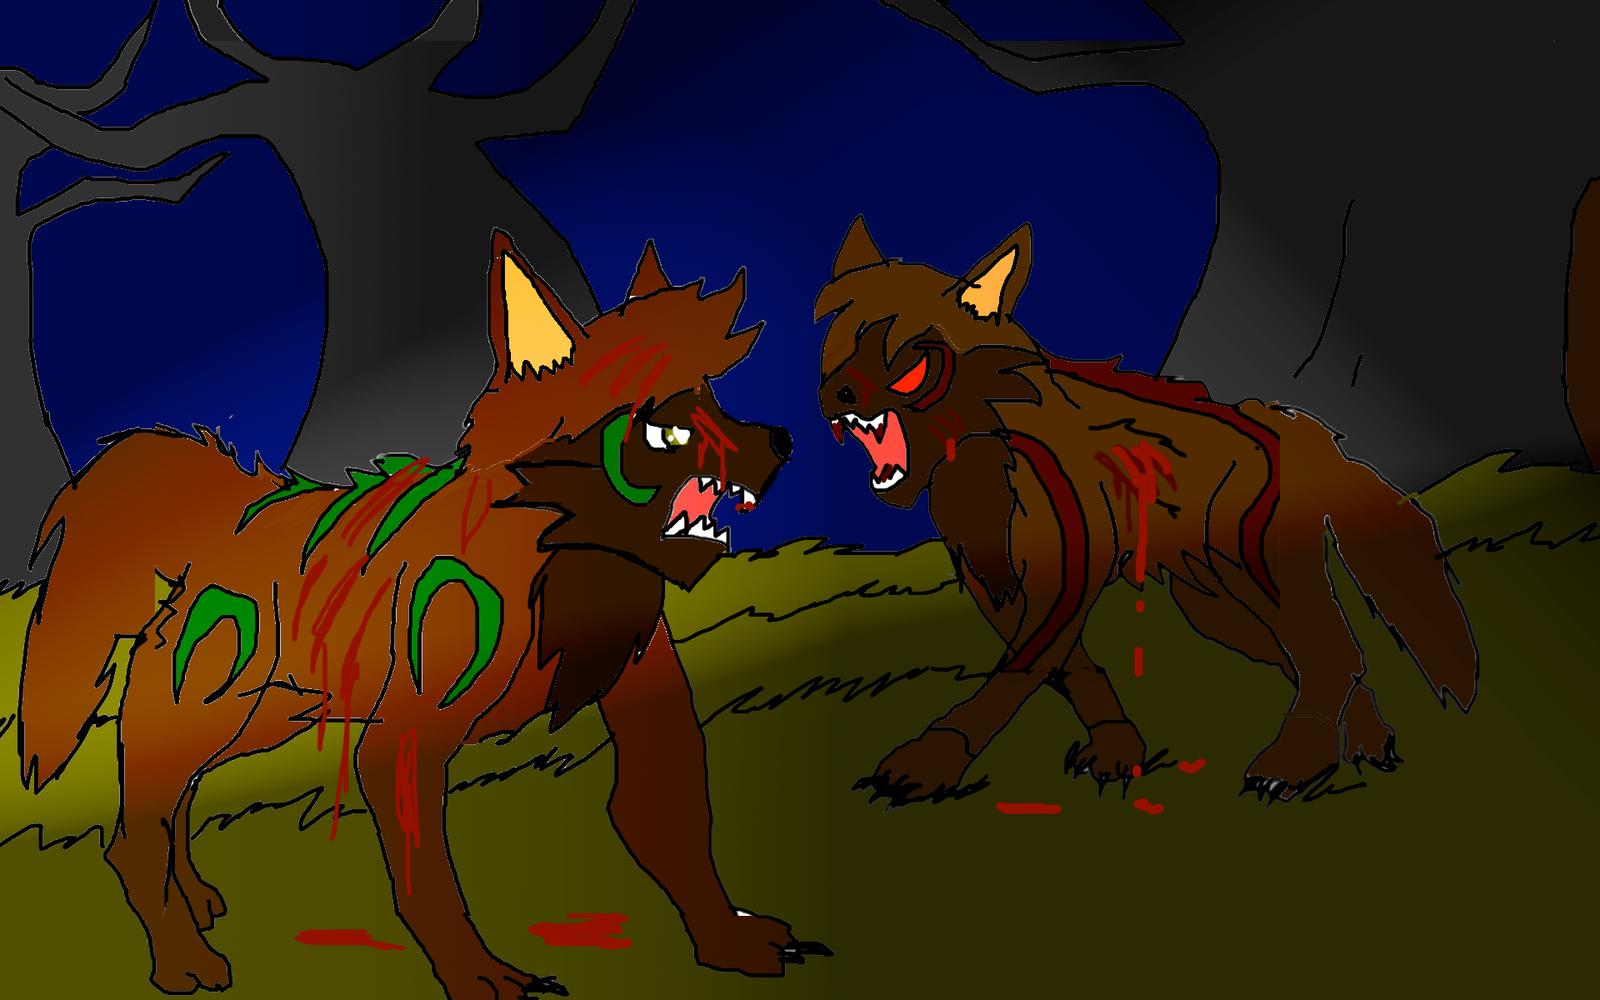 Wolf fight by ShadowClawZ